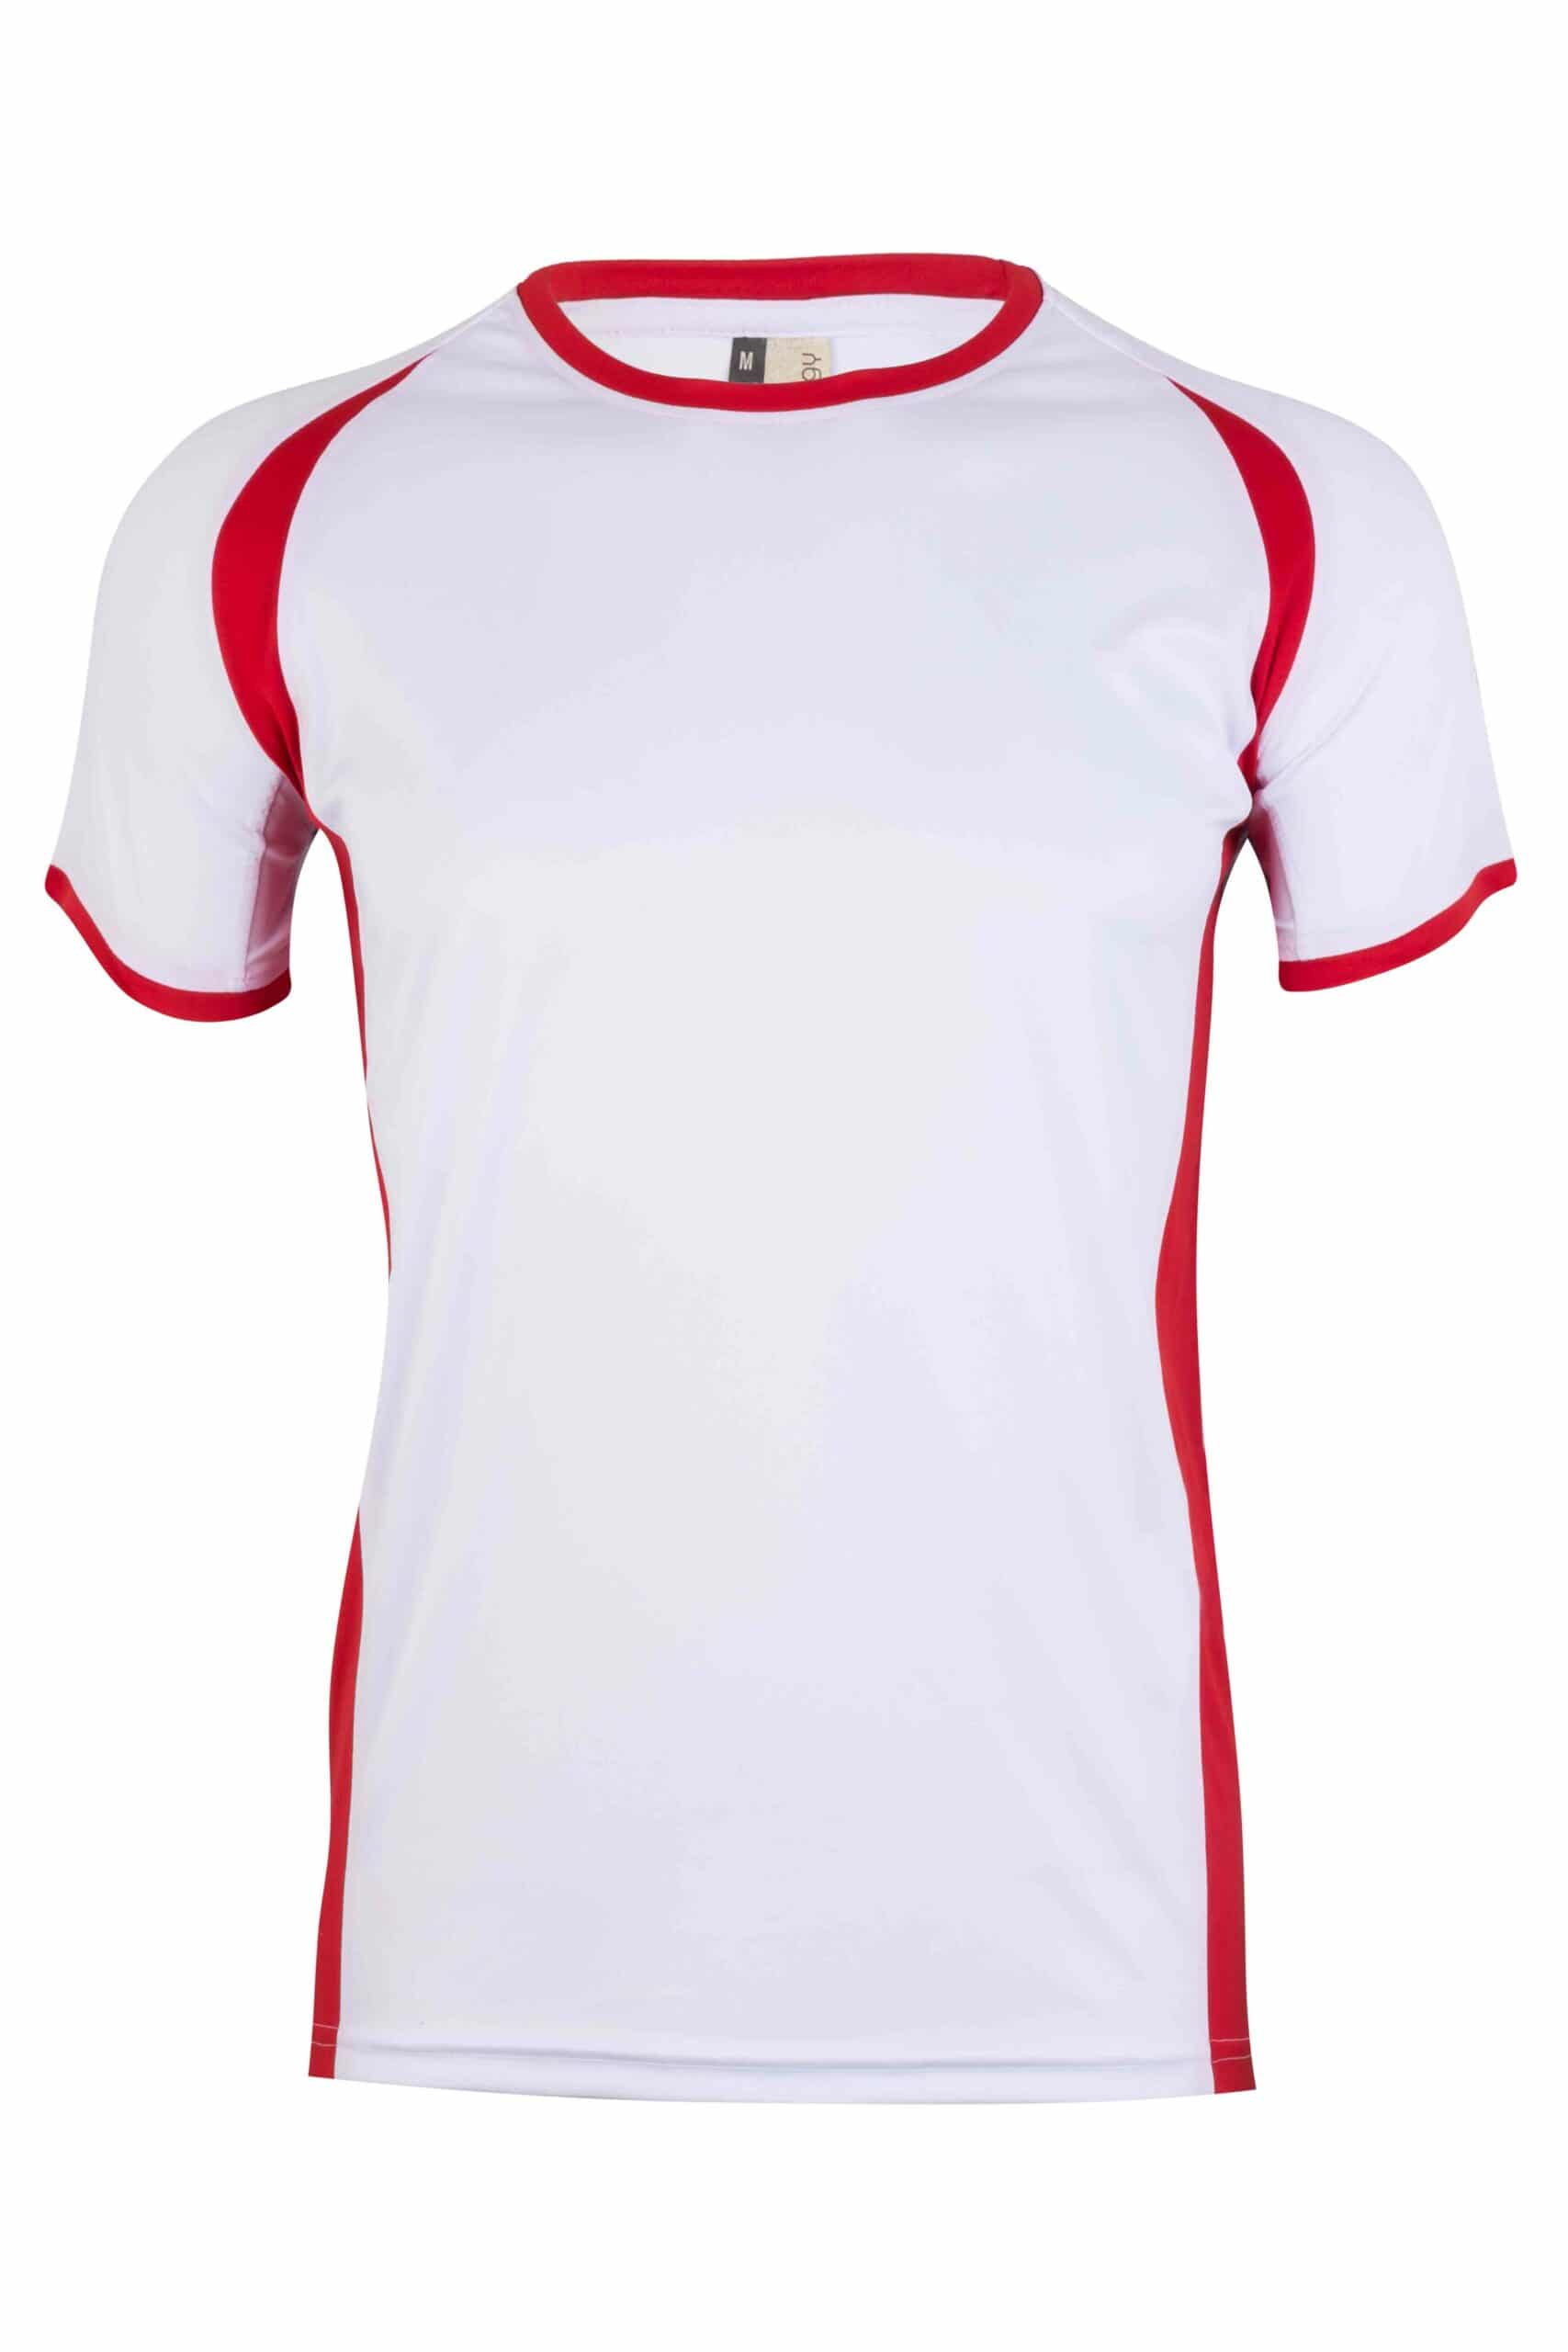 Mukua Mk530v Mukua Camiseta TÉcnica Manga Corta Bicolor White Red 1